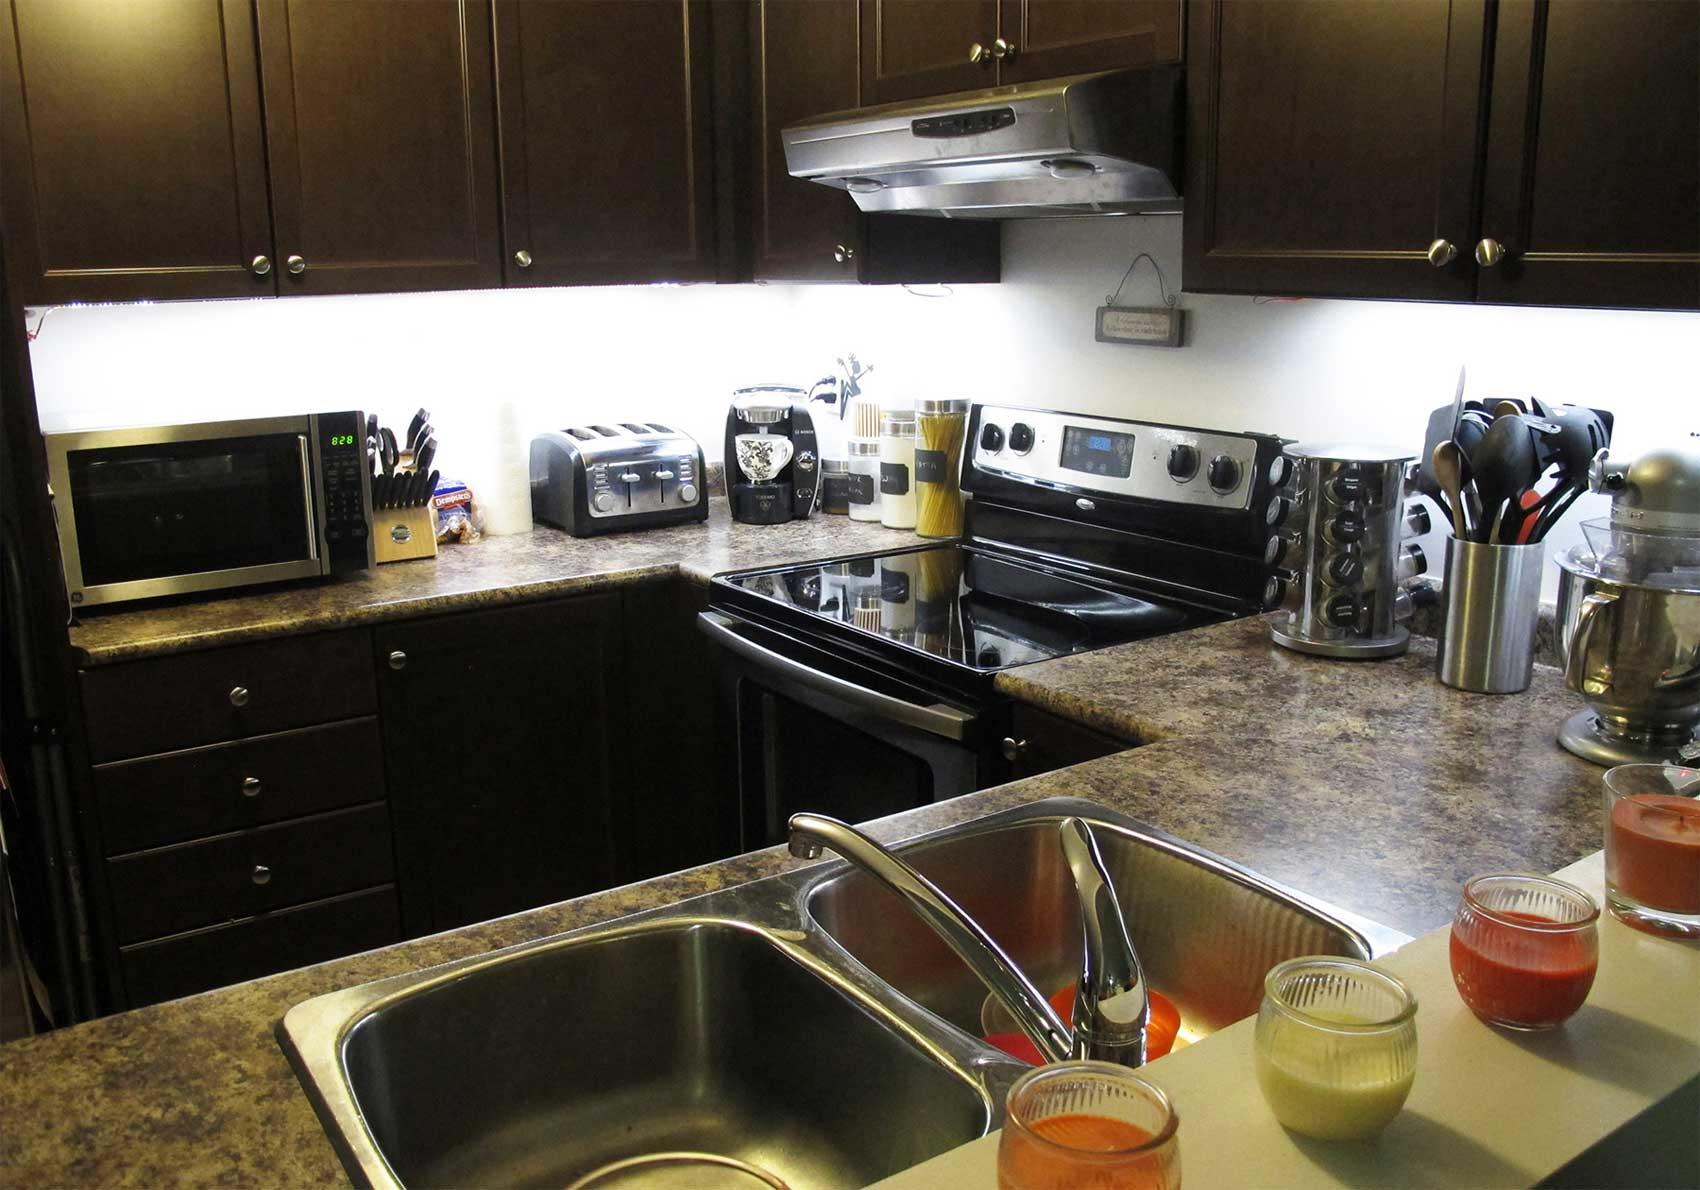 Kitchen under cabinet led lighting kits - Bright Under Cabinet Kitchen Lights